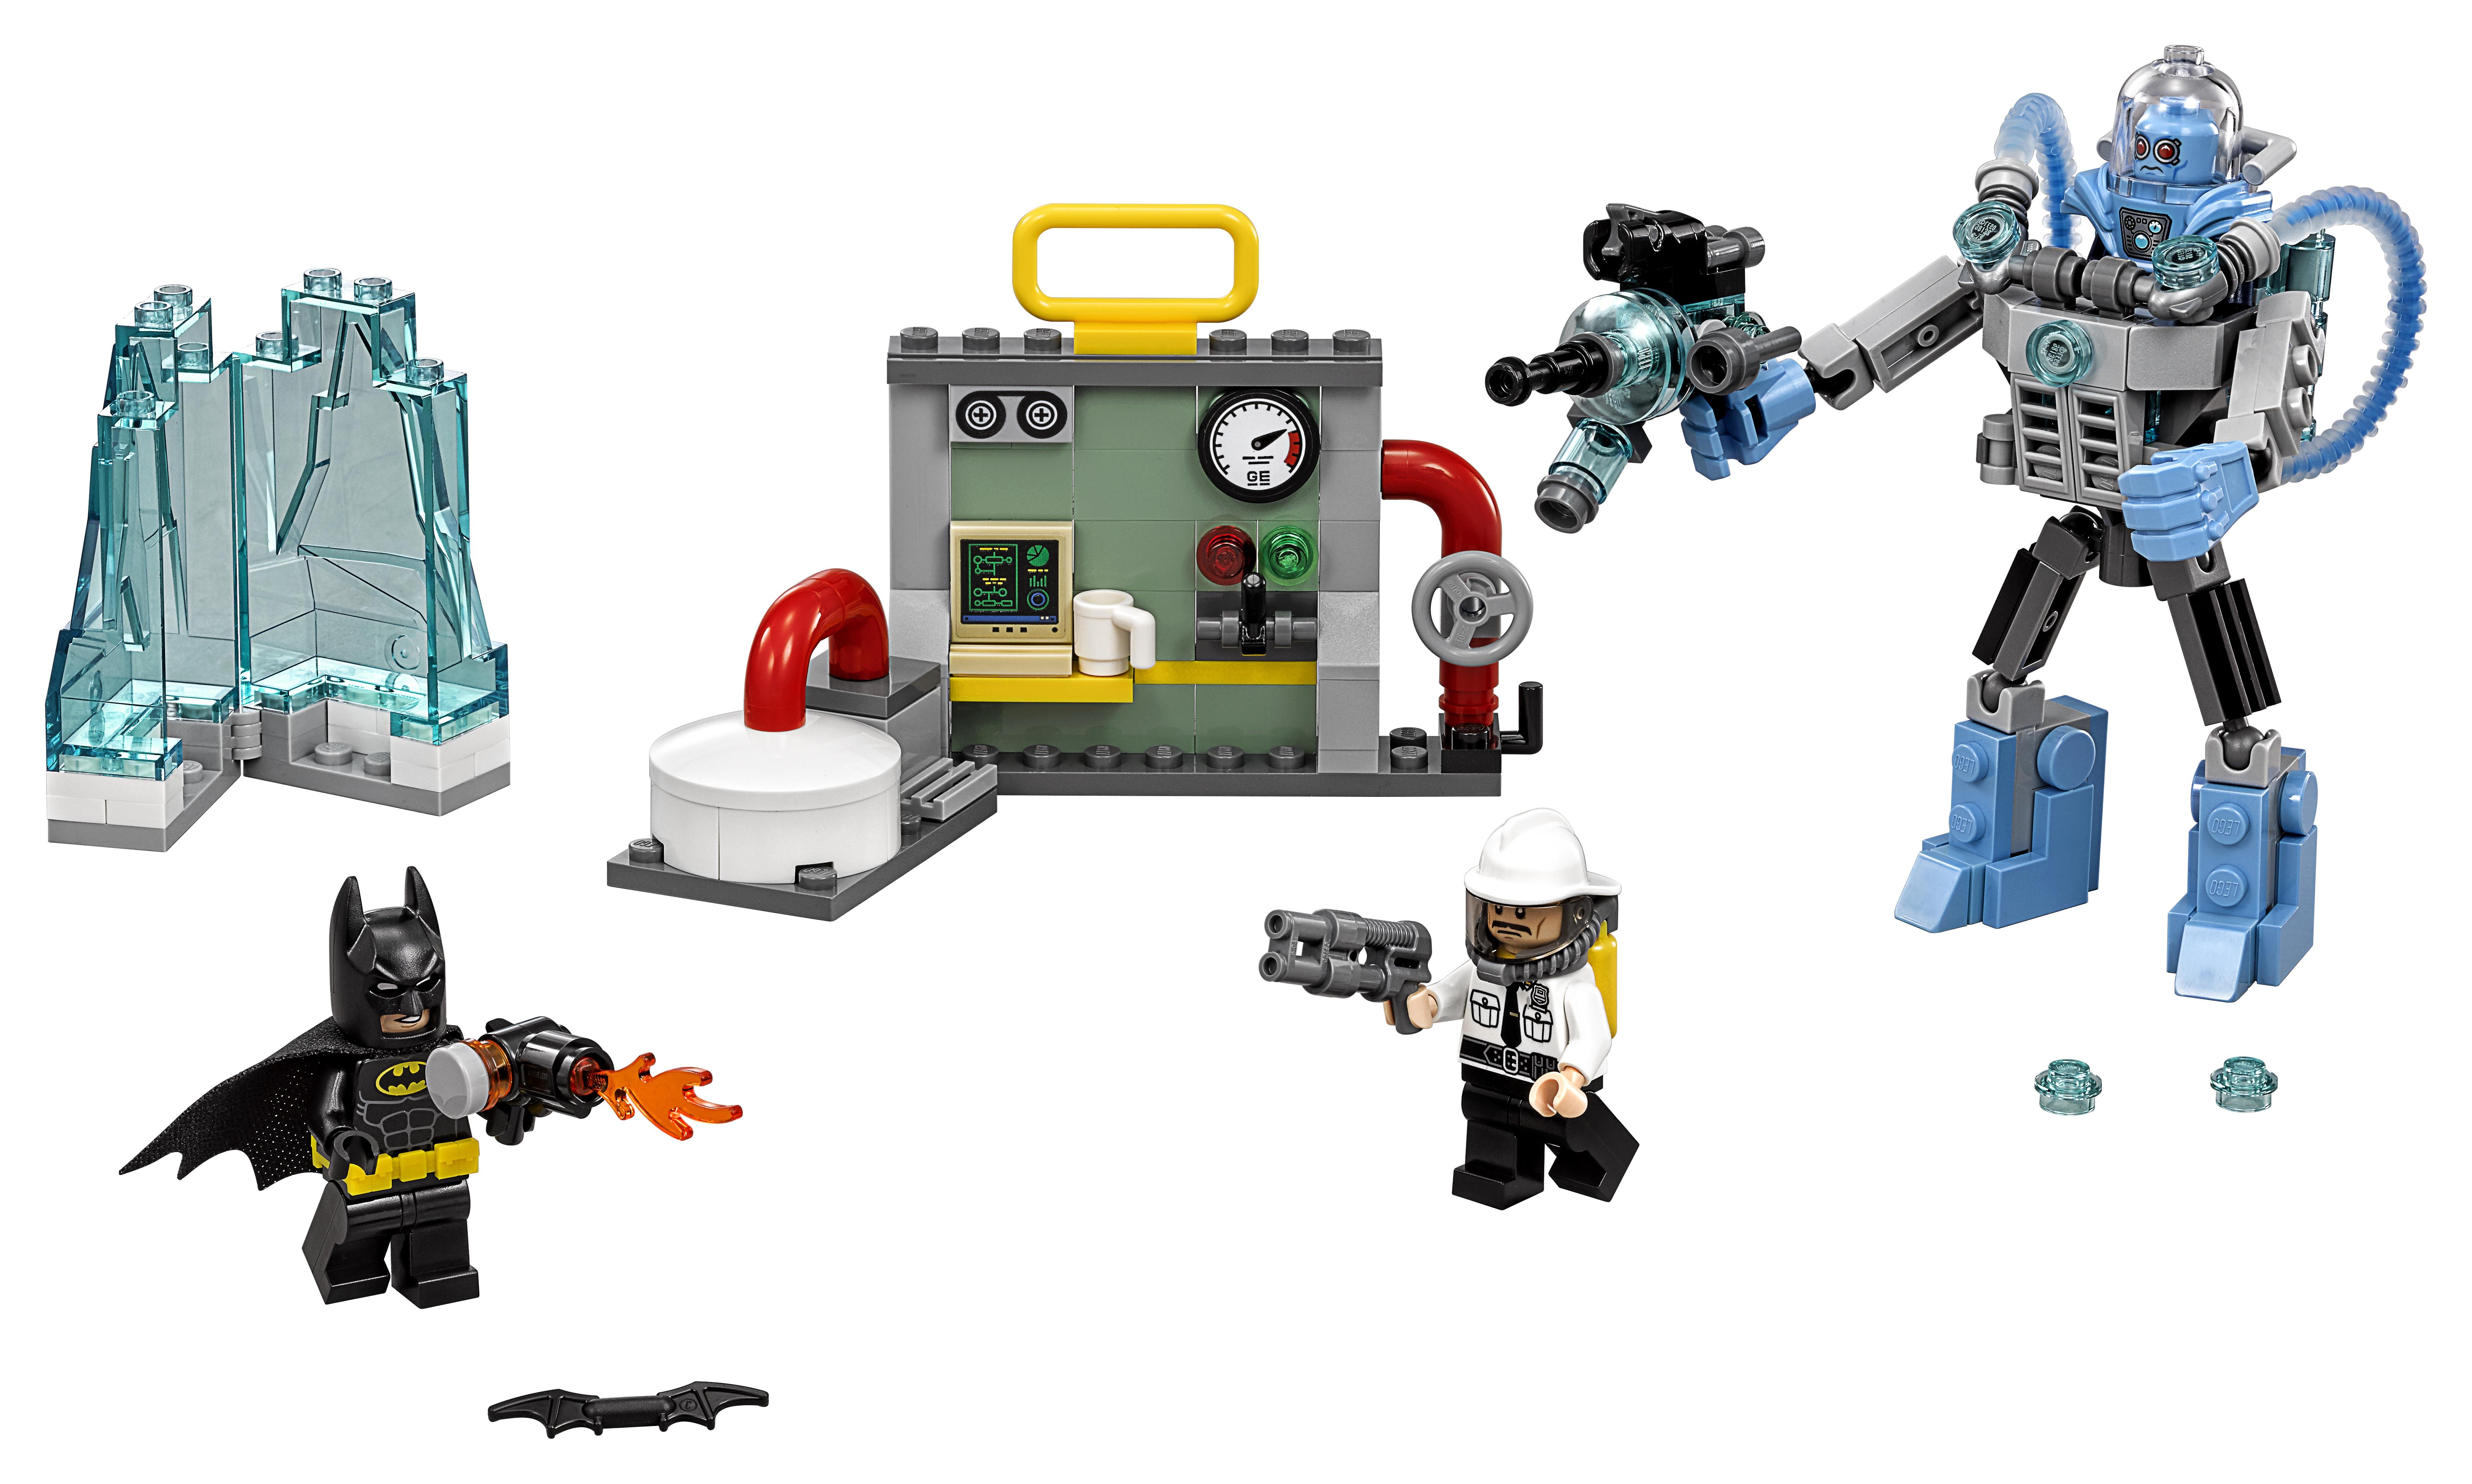 Конструктор LEGO Batman Movie 70901 Ледяная aтака Мистера Фриза конструктор lego juniors 10737 бэтмен против мистера фриза